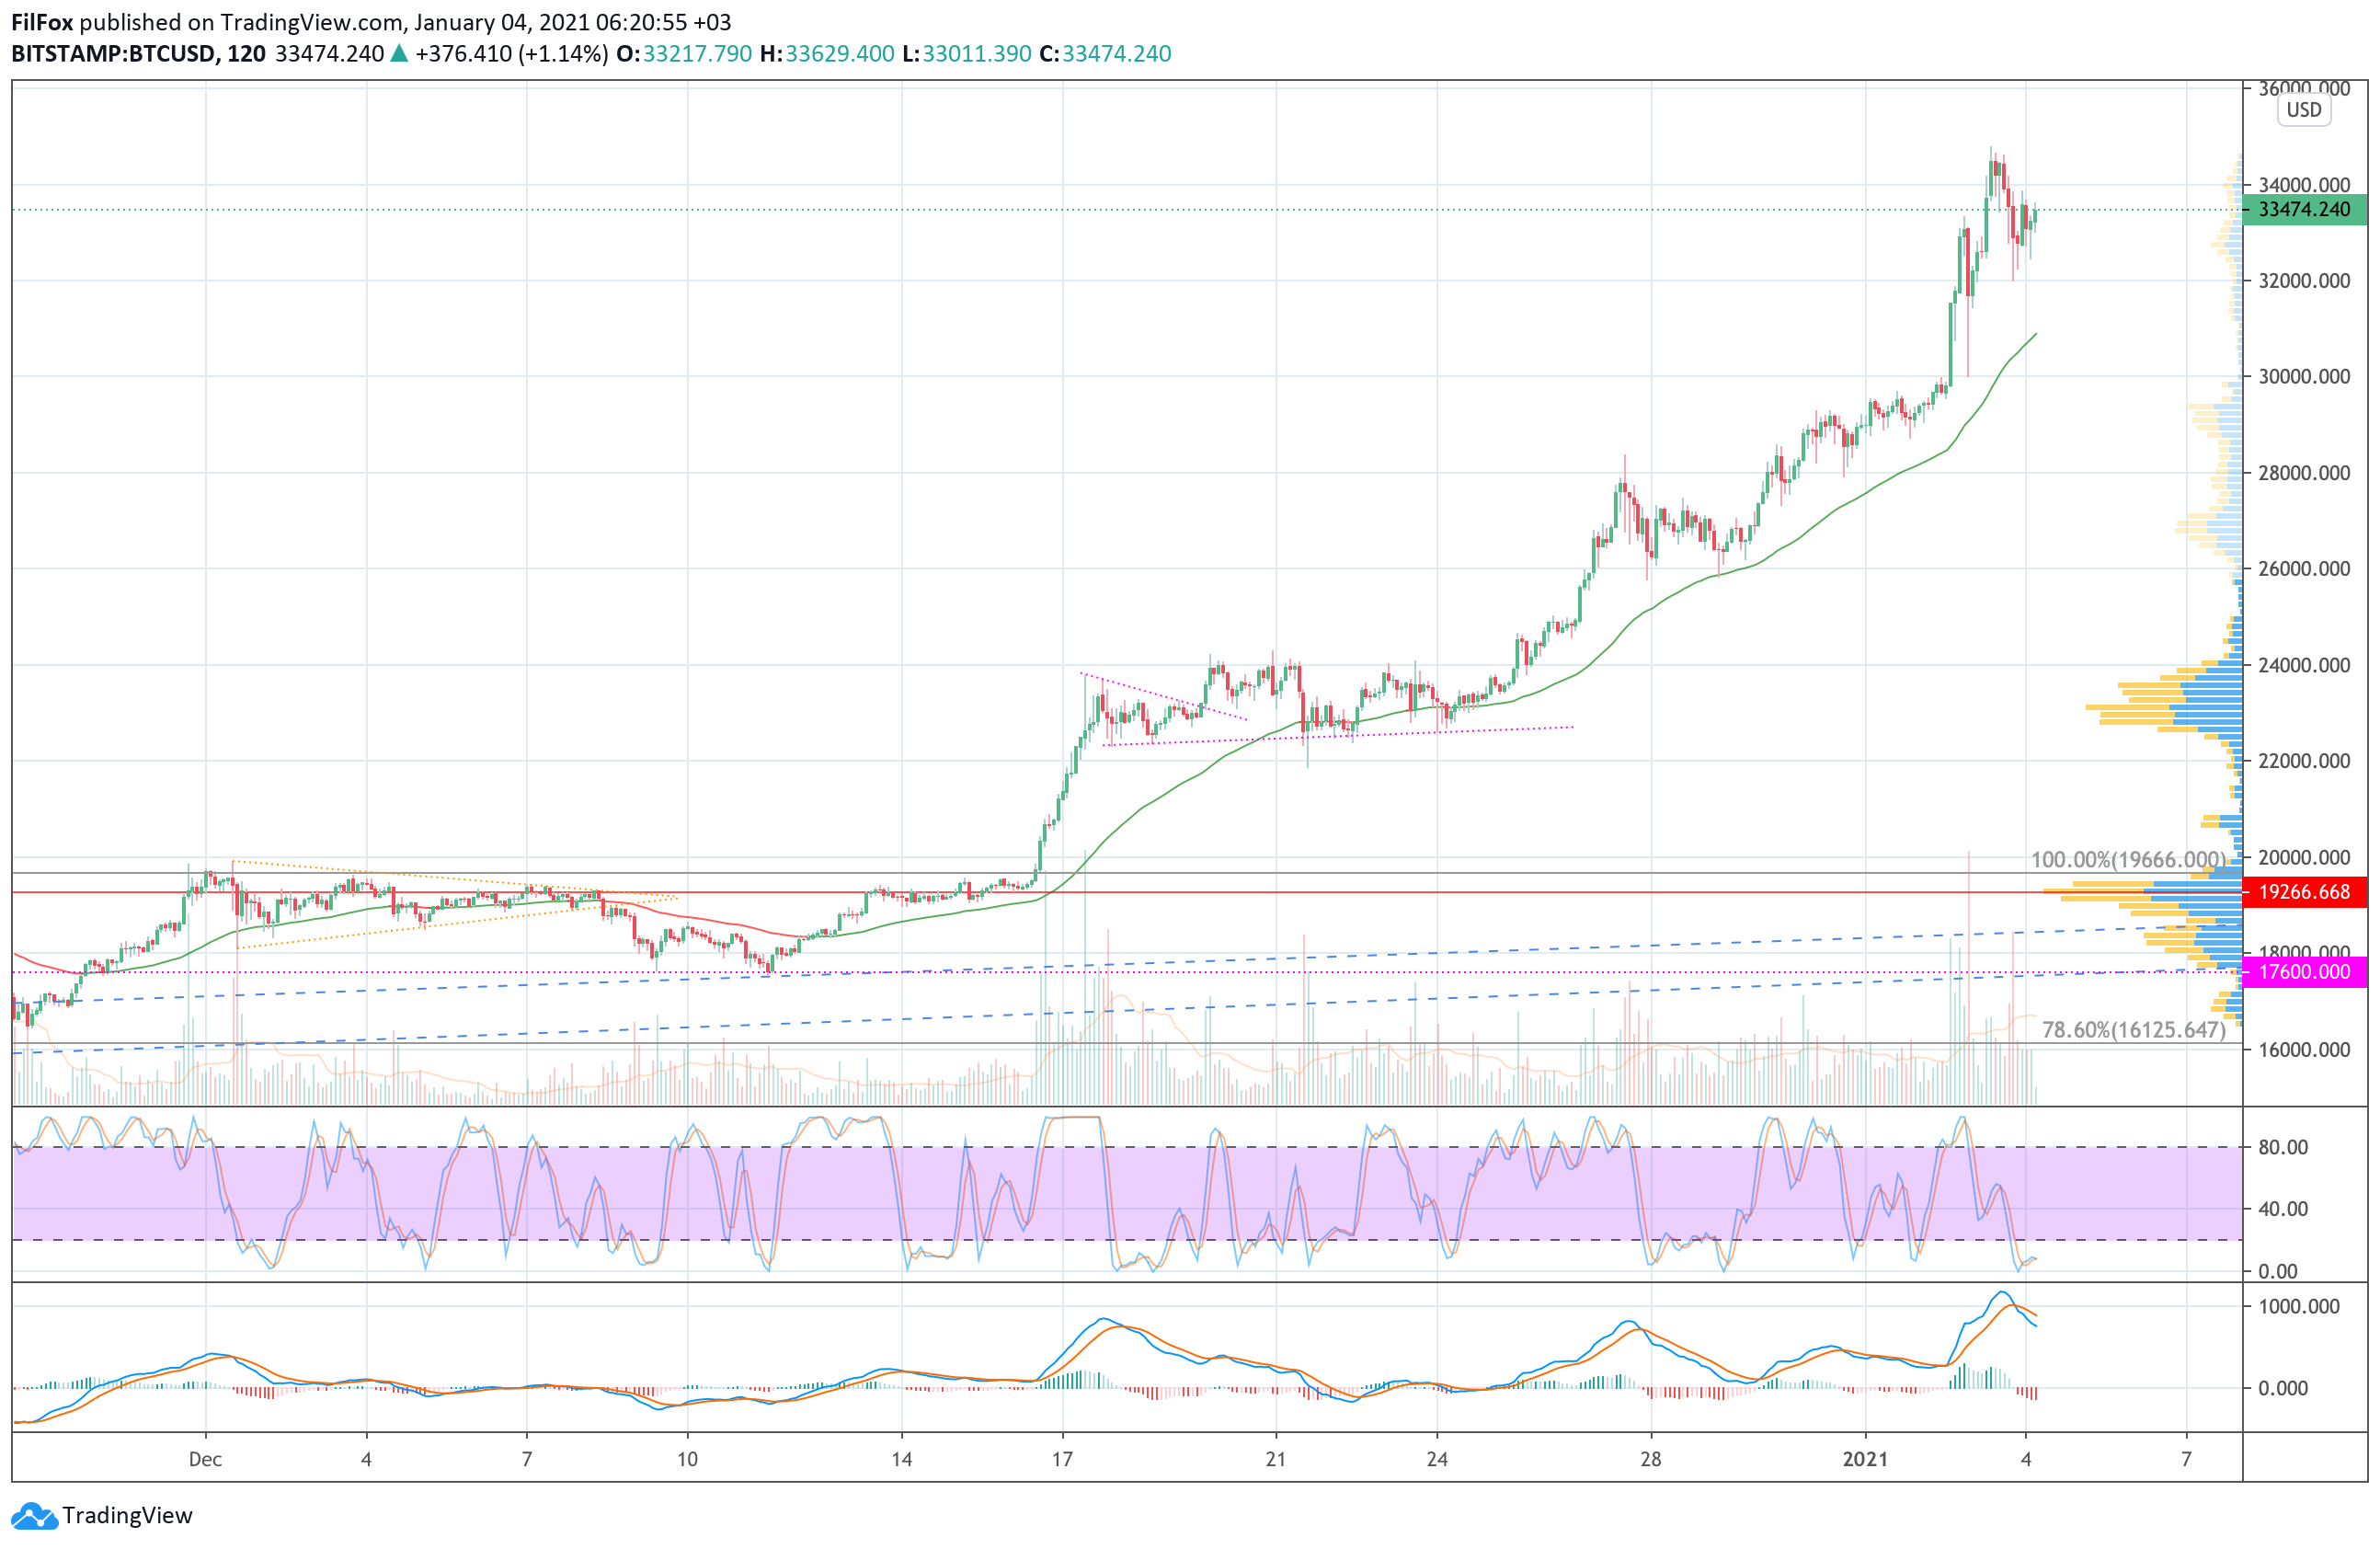 Анализ цен Bitcoin, Ethereum, Ripple на 04.01.2021